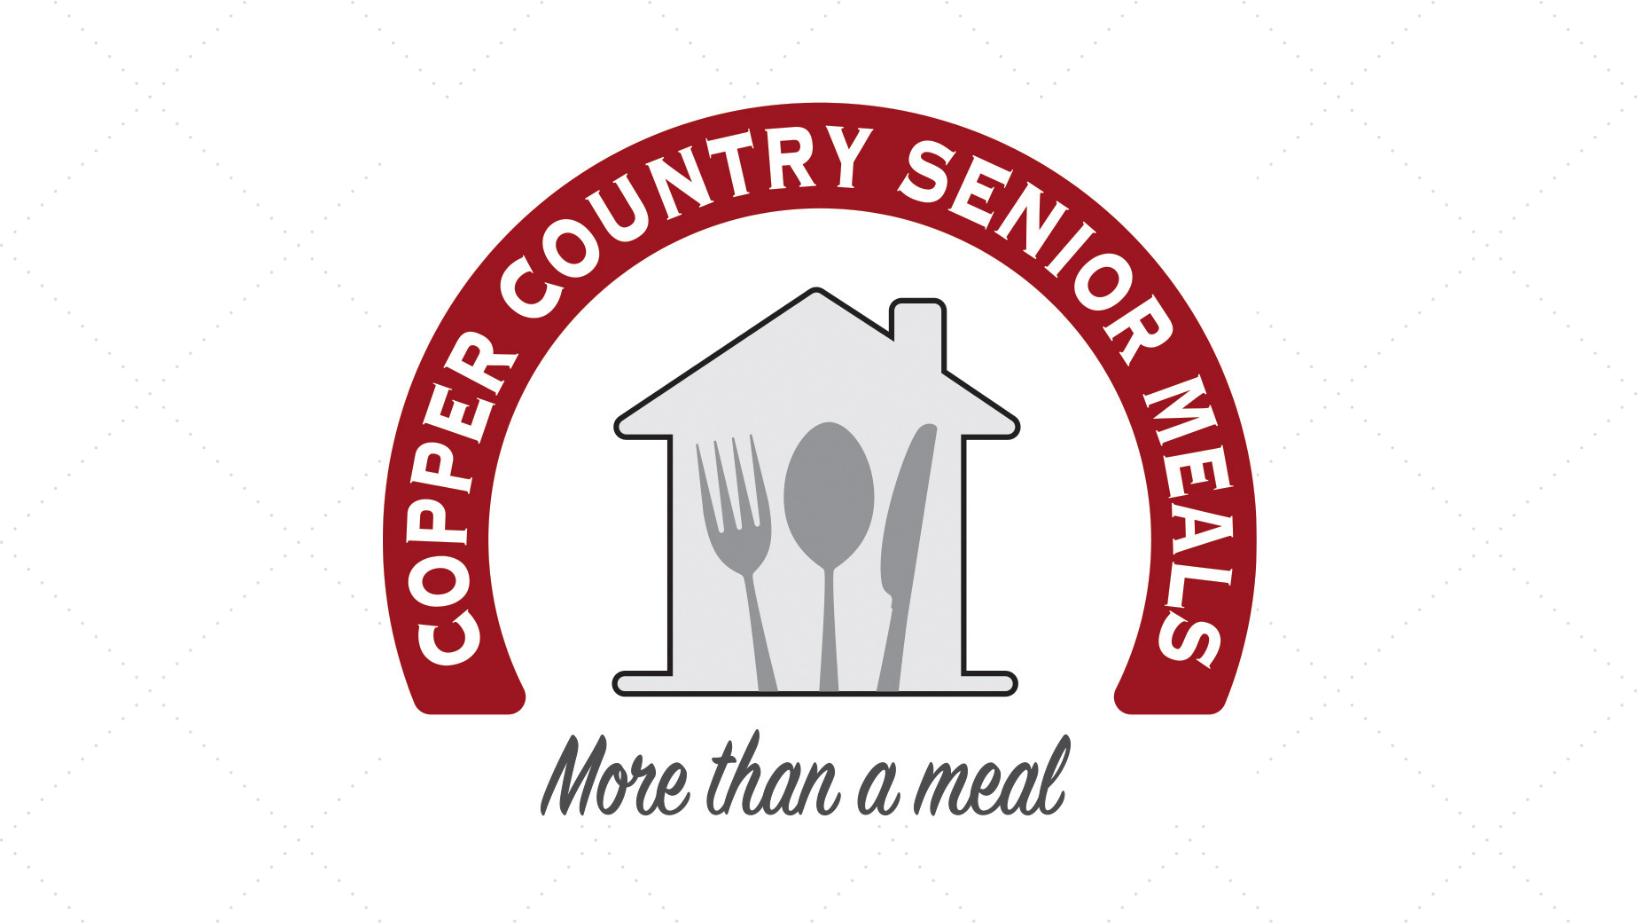 Copper Country Senior Meals